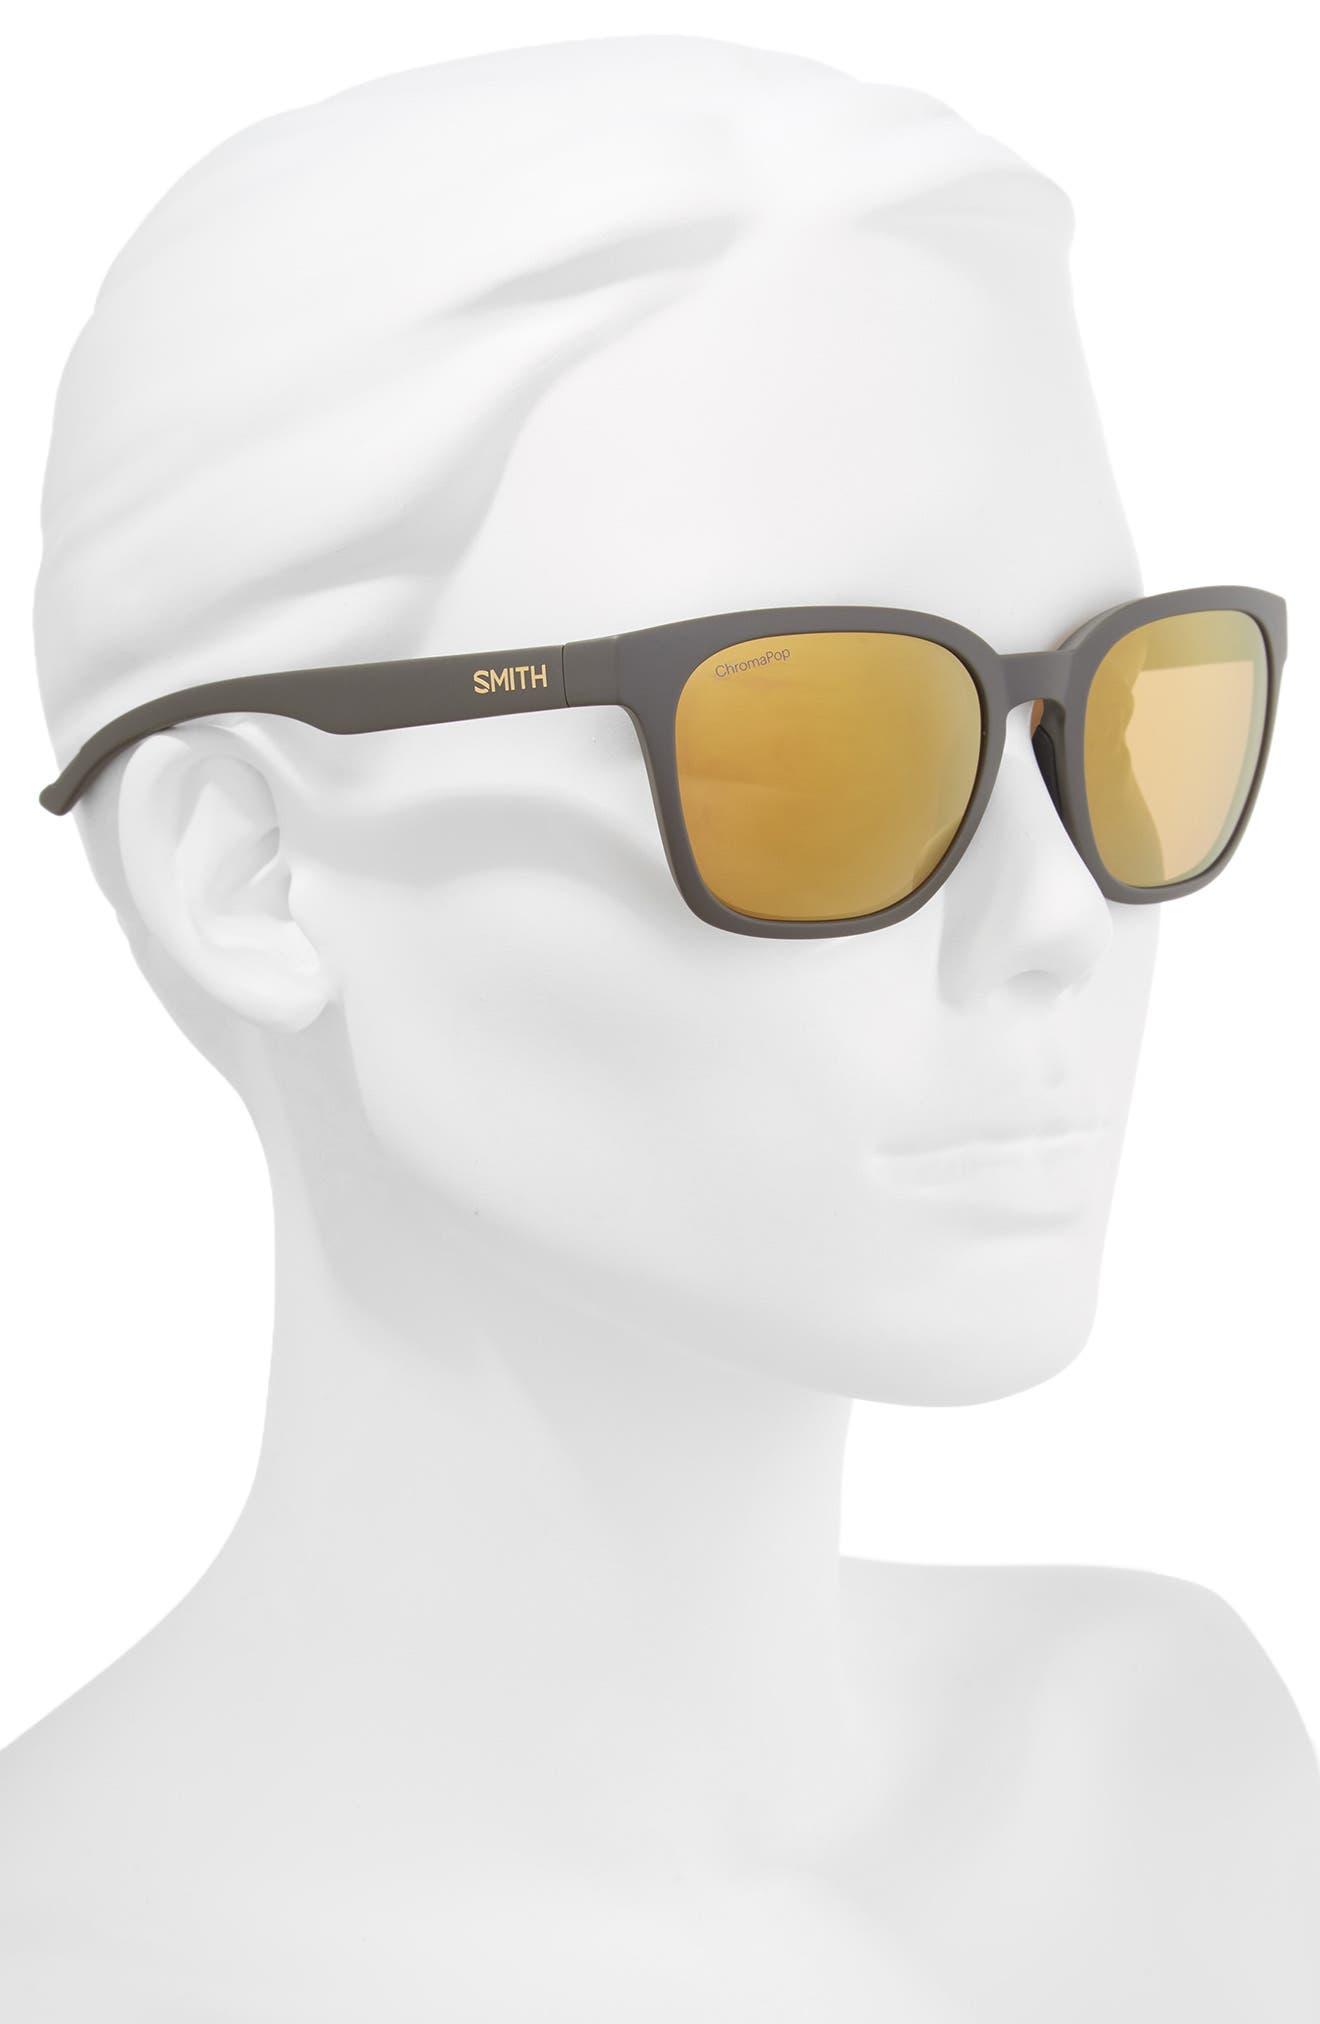 Founder 55mm ChromaPop<sup>™</sup> Polarized Sunglasses,                             Alternate thumbnail 2, color,                             Matte Gravy